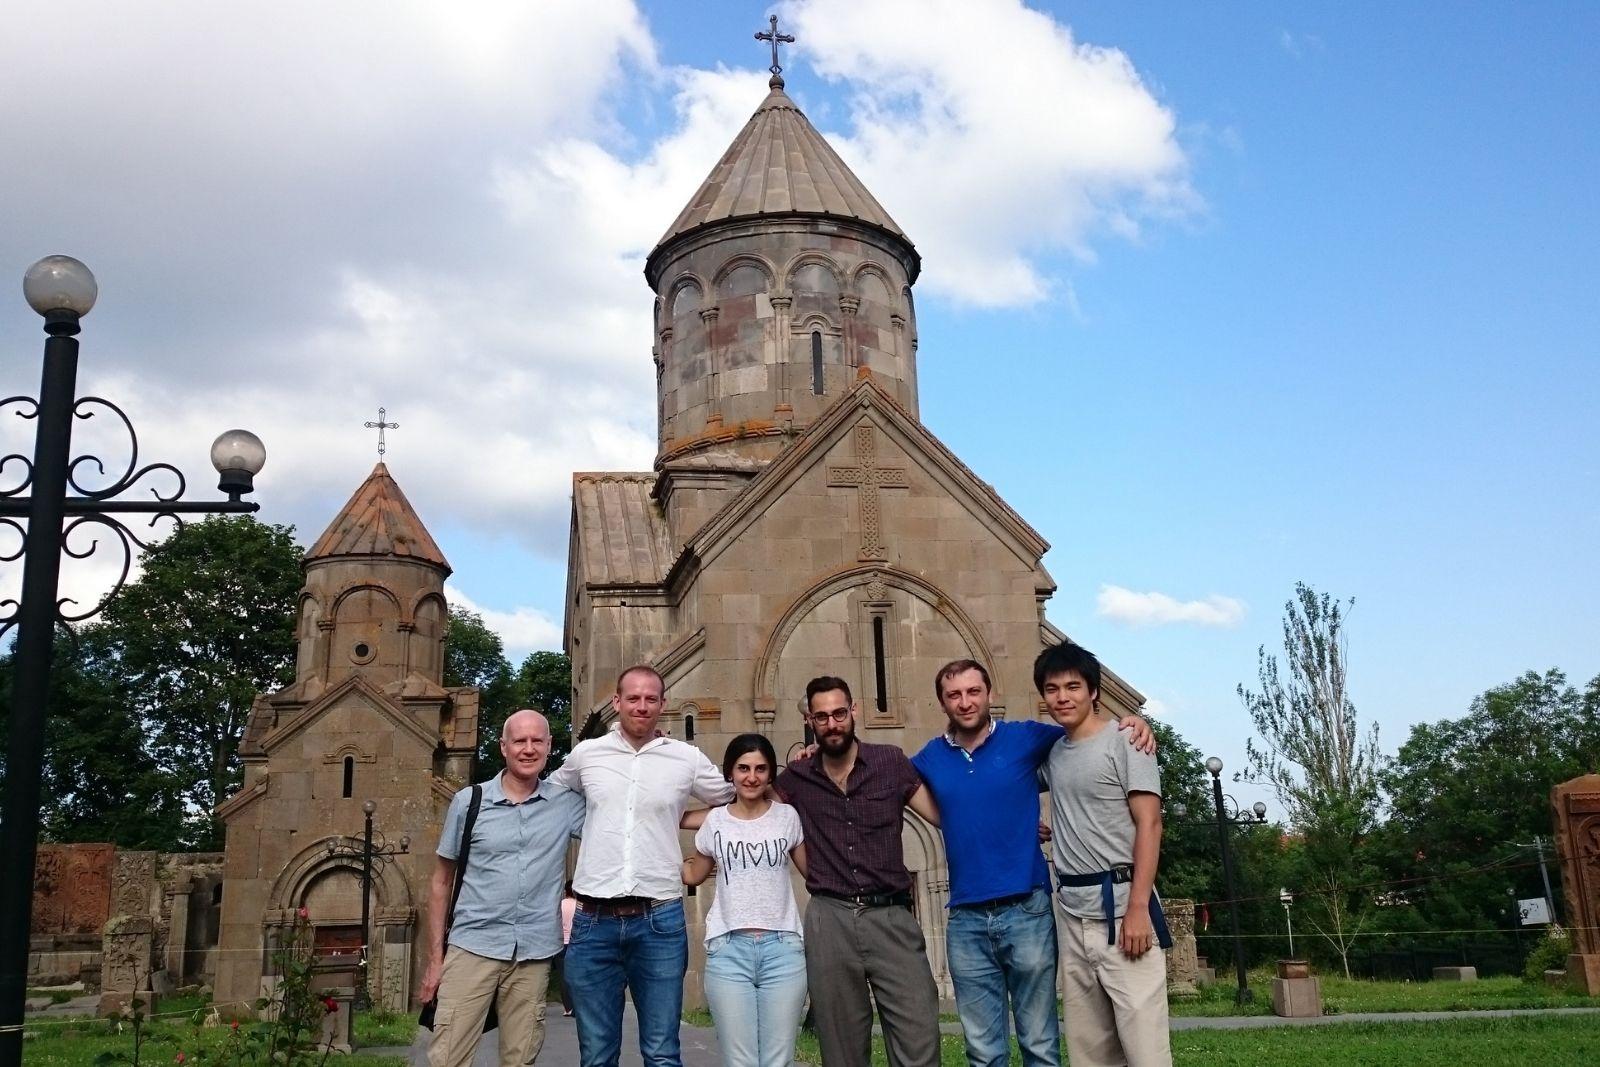 From left to right: John Winter, Thomas Jurczyk, Sona Mnatsakanyan (instructor of Armenian), Nicholas Matheou, Khachik Gevorgyan (Director of ASPIRANTUM), Chihiro Taguchi